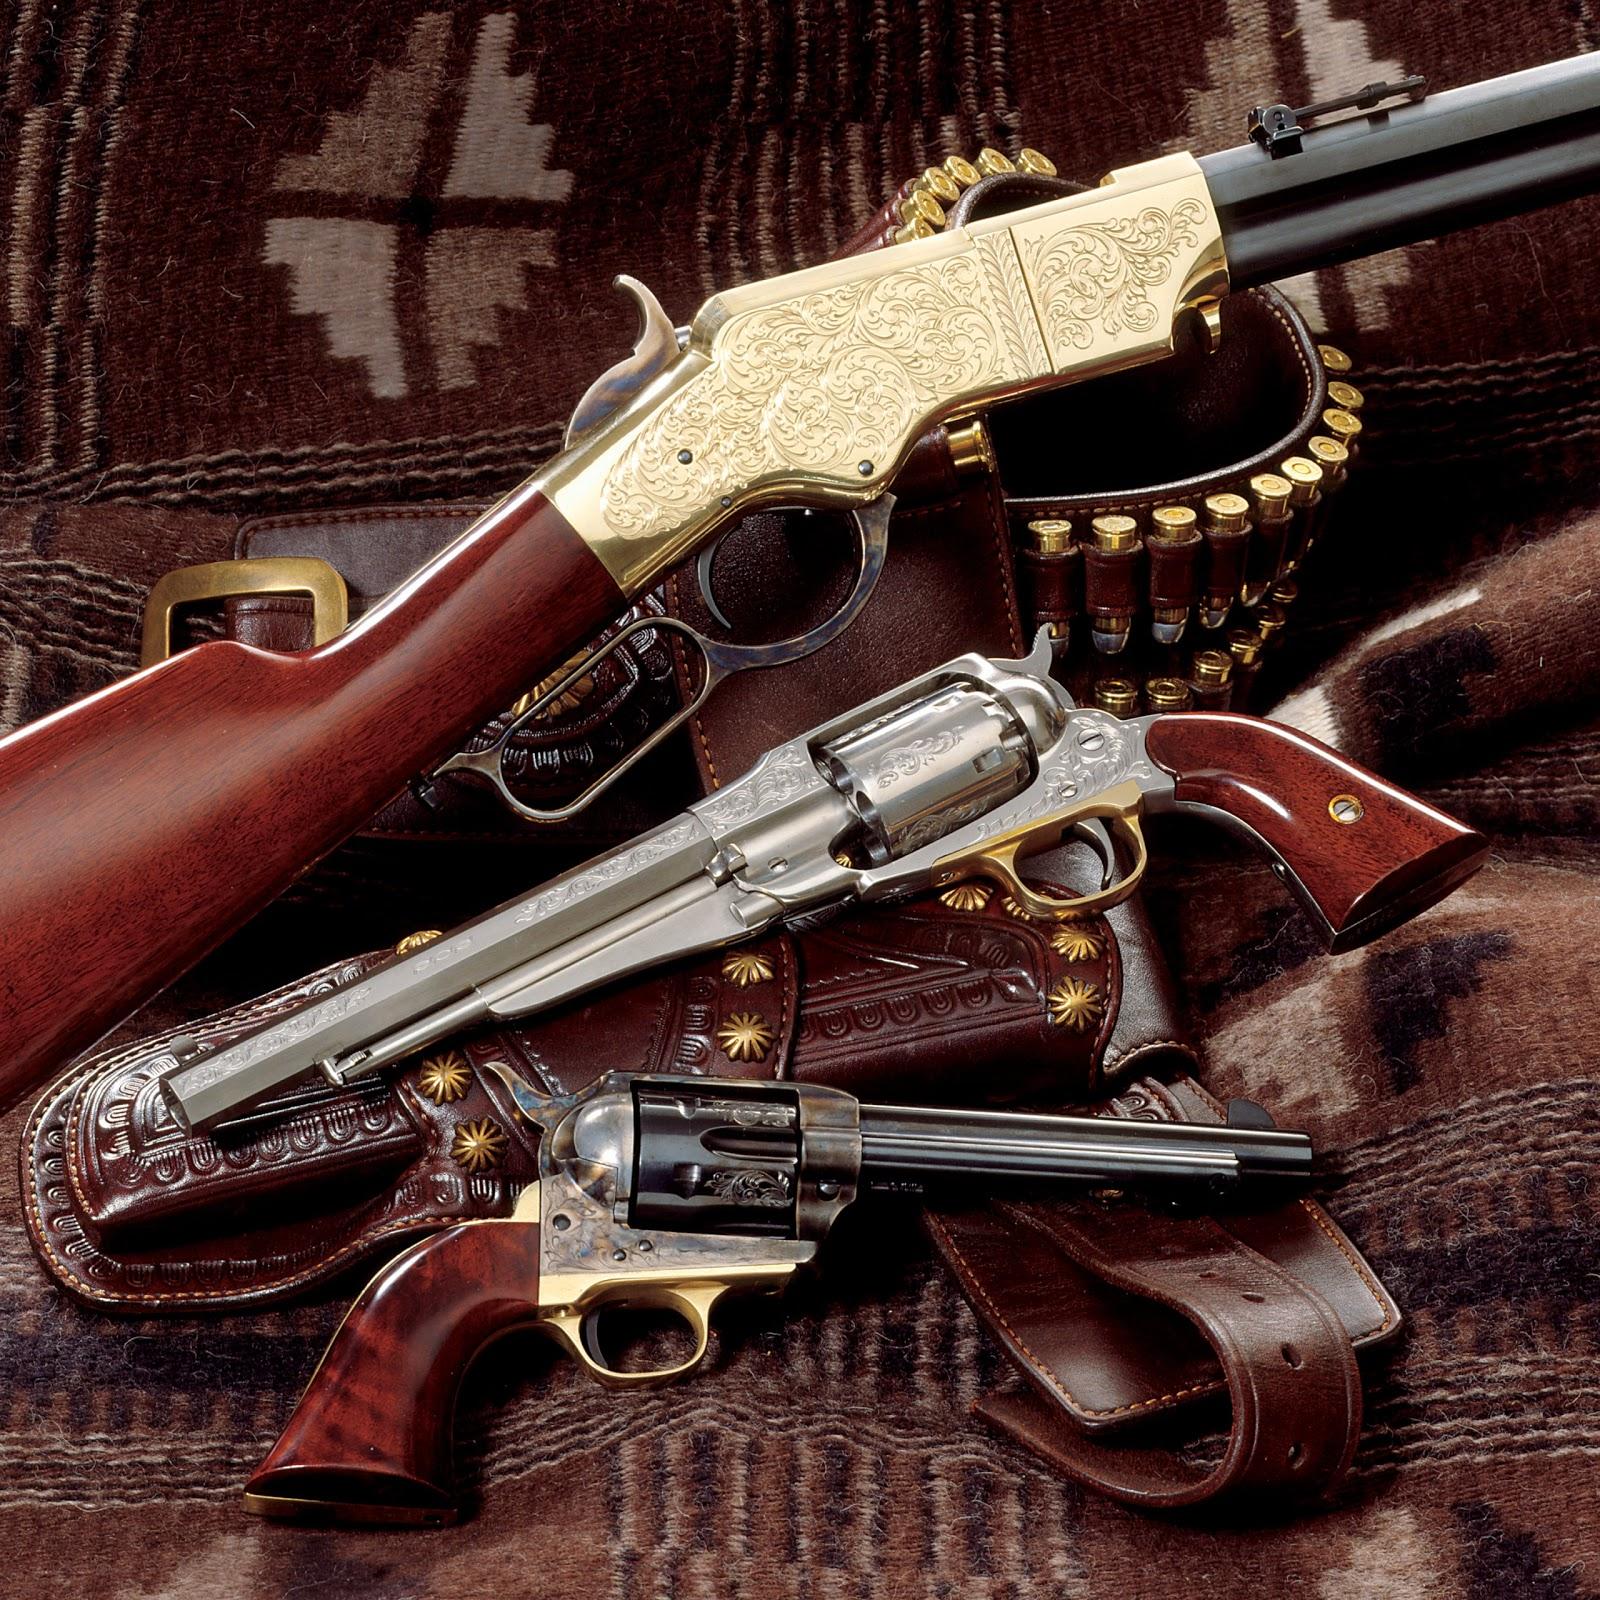 Cowboy Guns Wallpaper Guns & Weapons: Co...